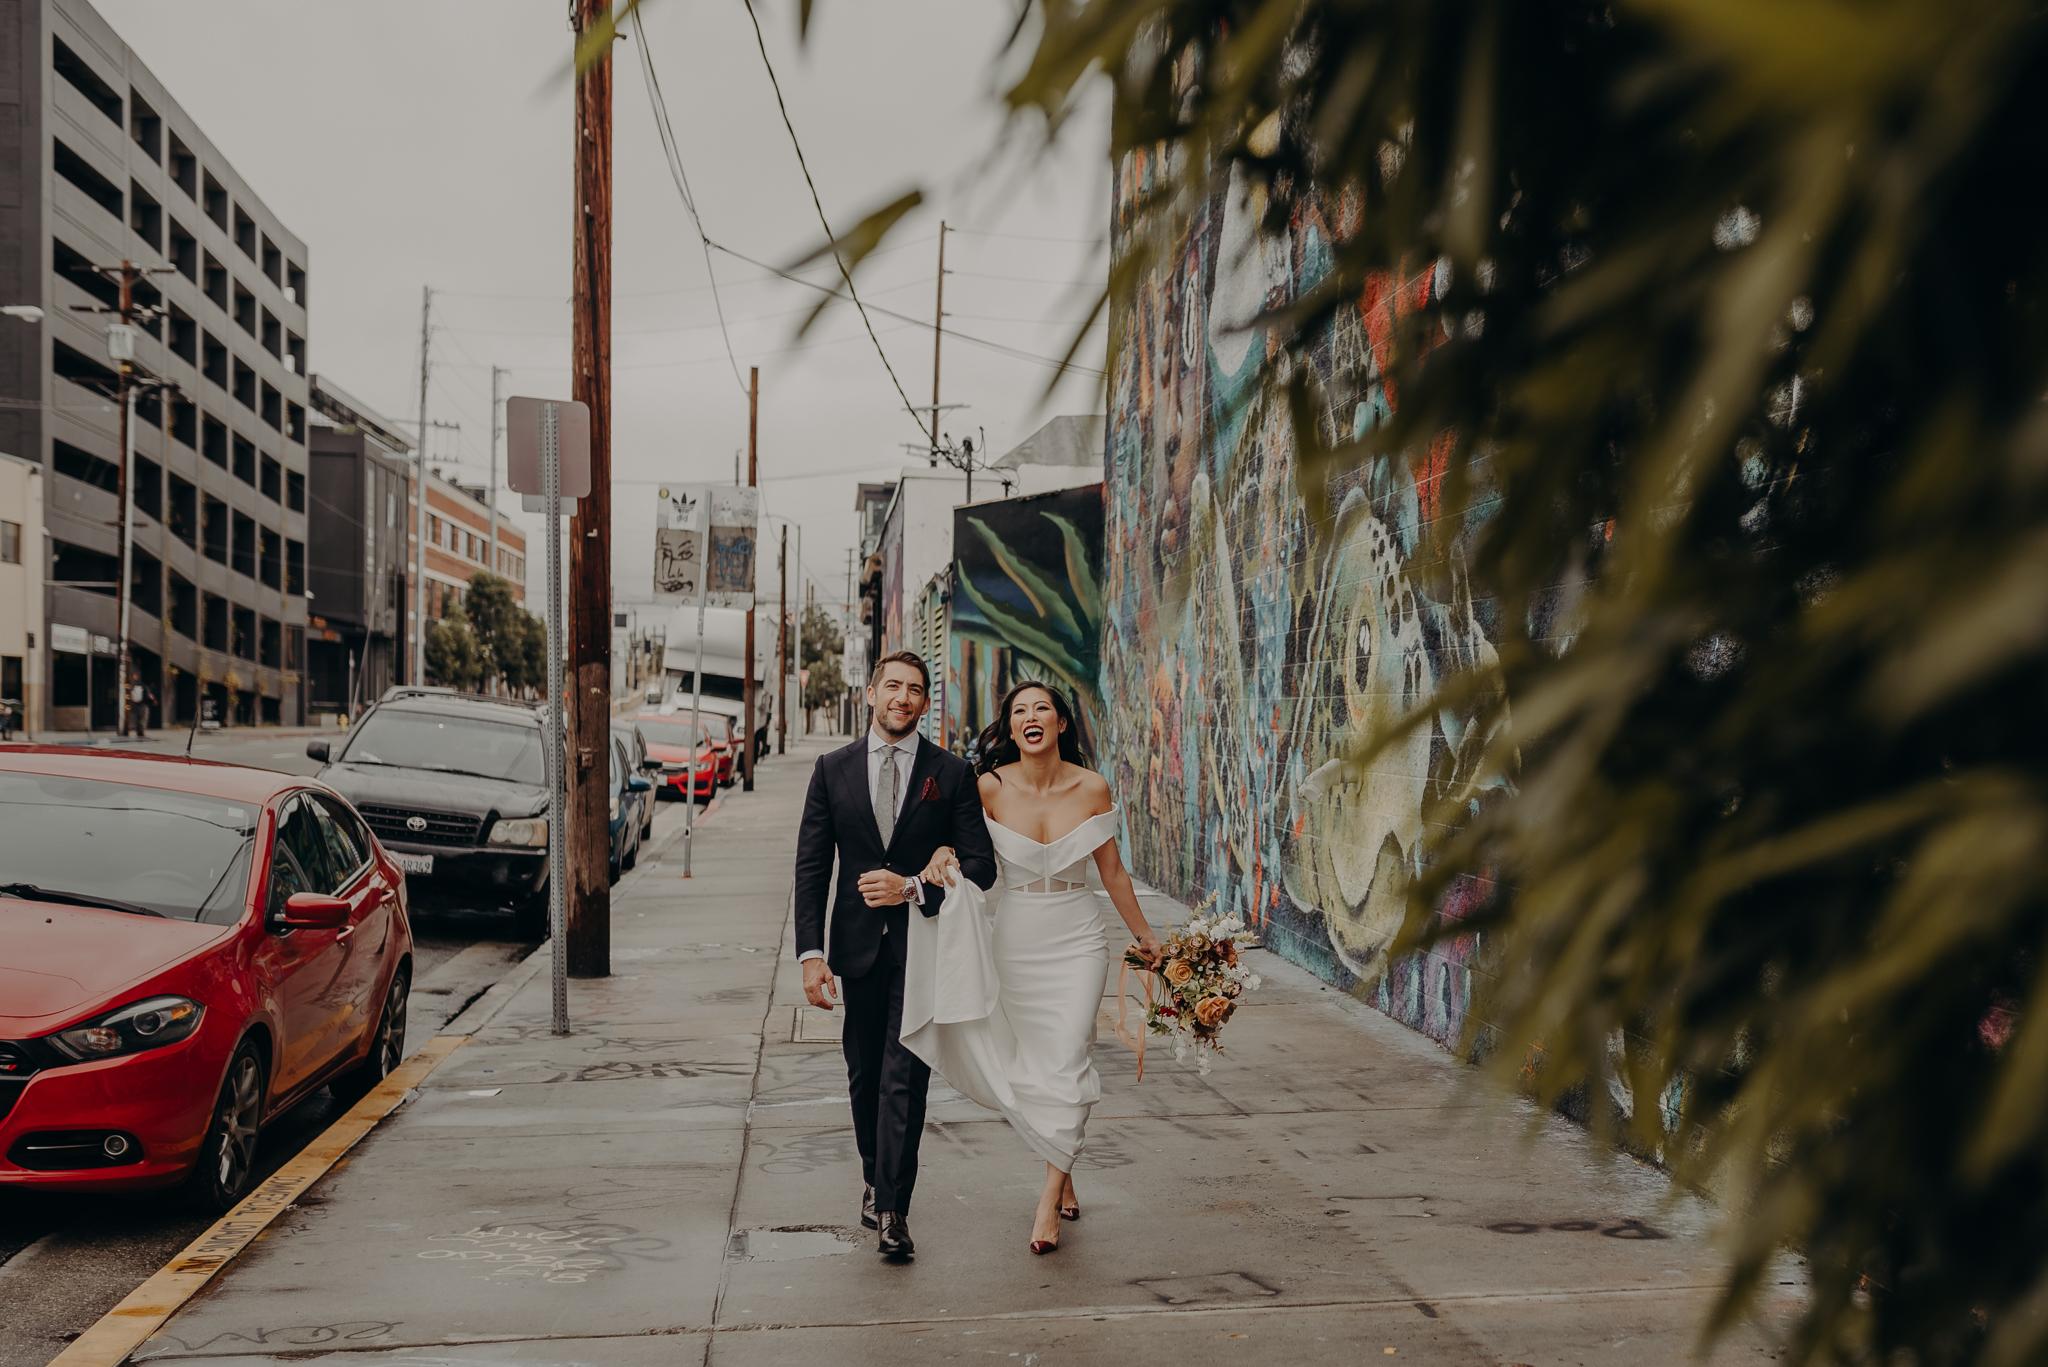 Wedding Photo LA - wedding photographer in los angeles - millwick wedding venue -isaiahandtaylor.com-065.jpg